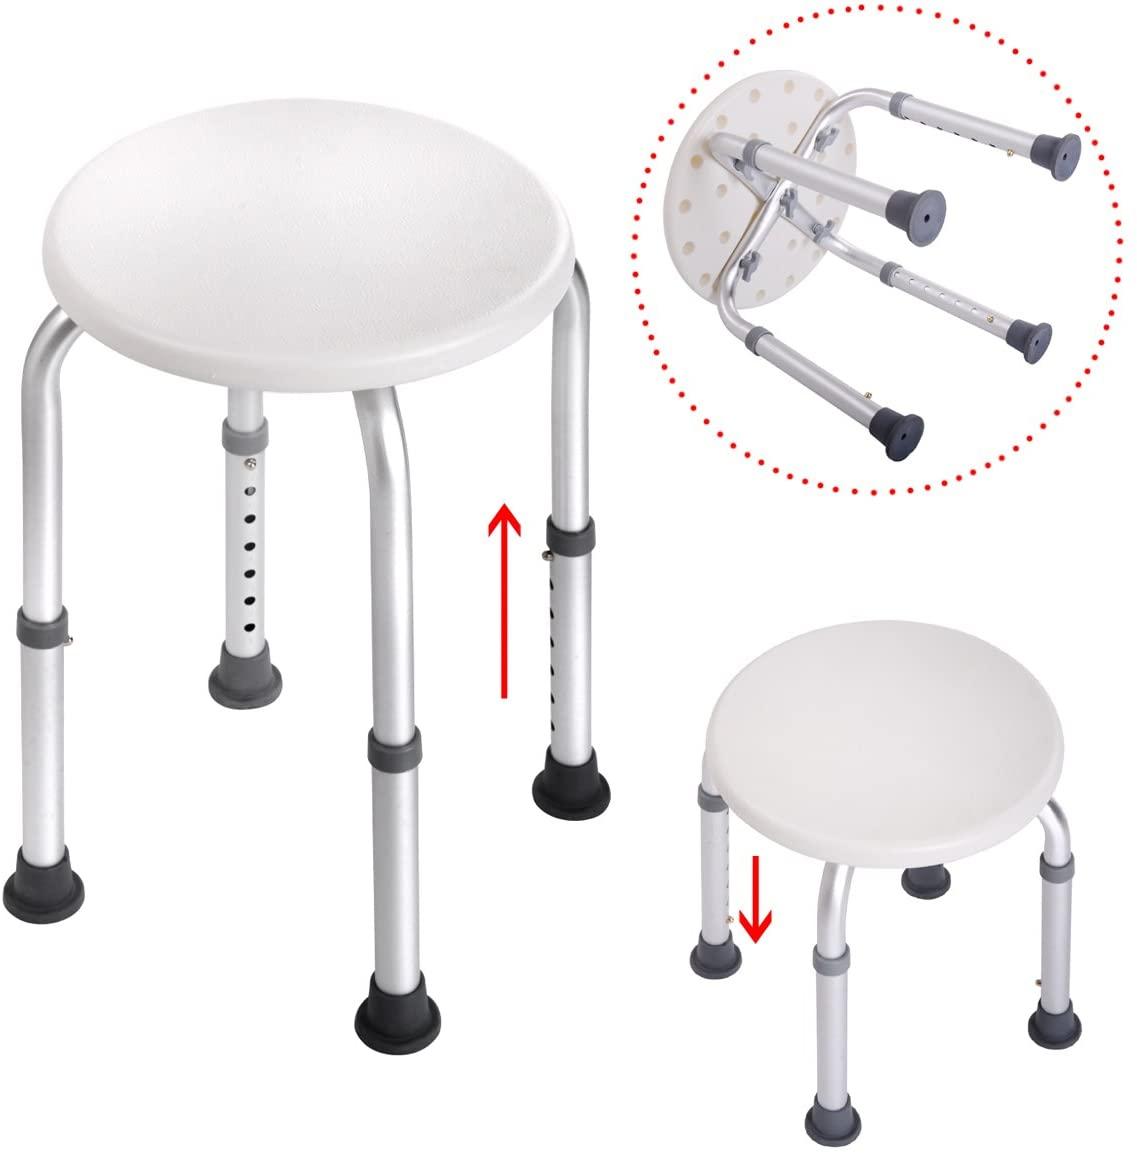 JAXPETY 7 Height Adjustable Stool Bath Bench Lightweight Shower w/Non-Slip Seat Round White